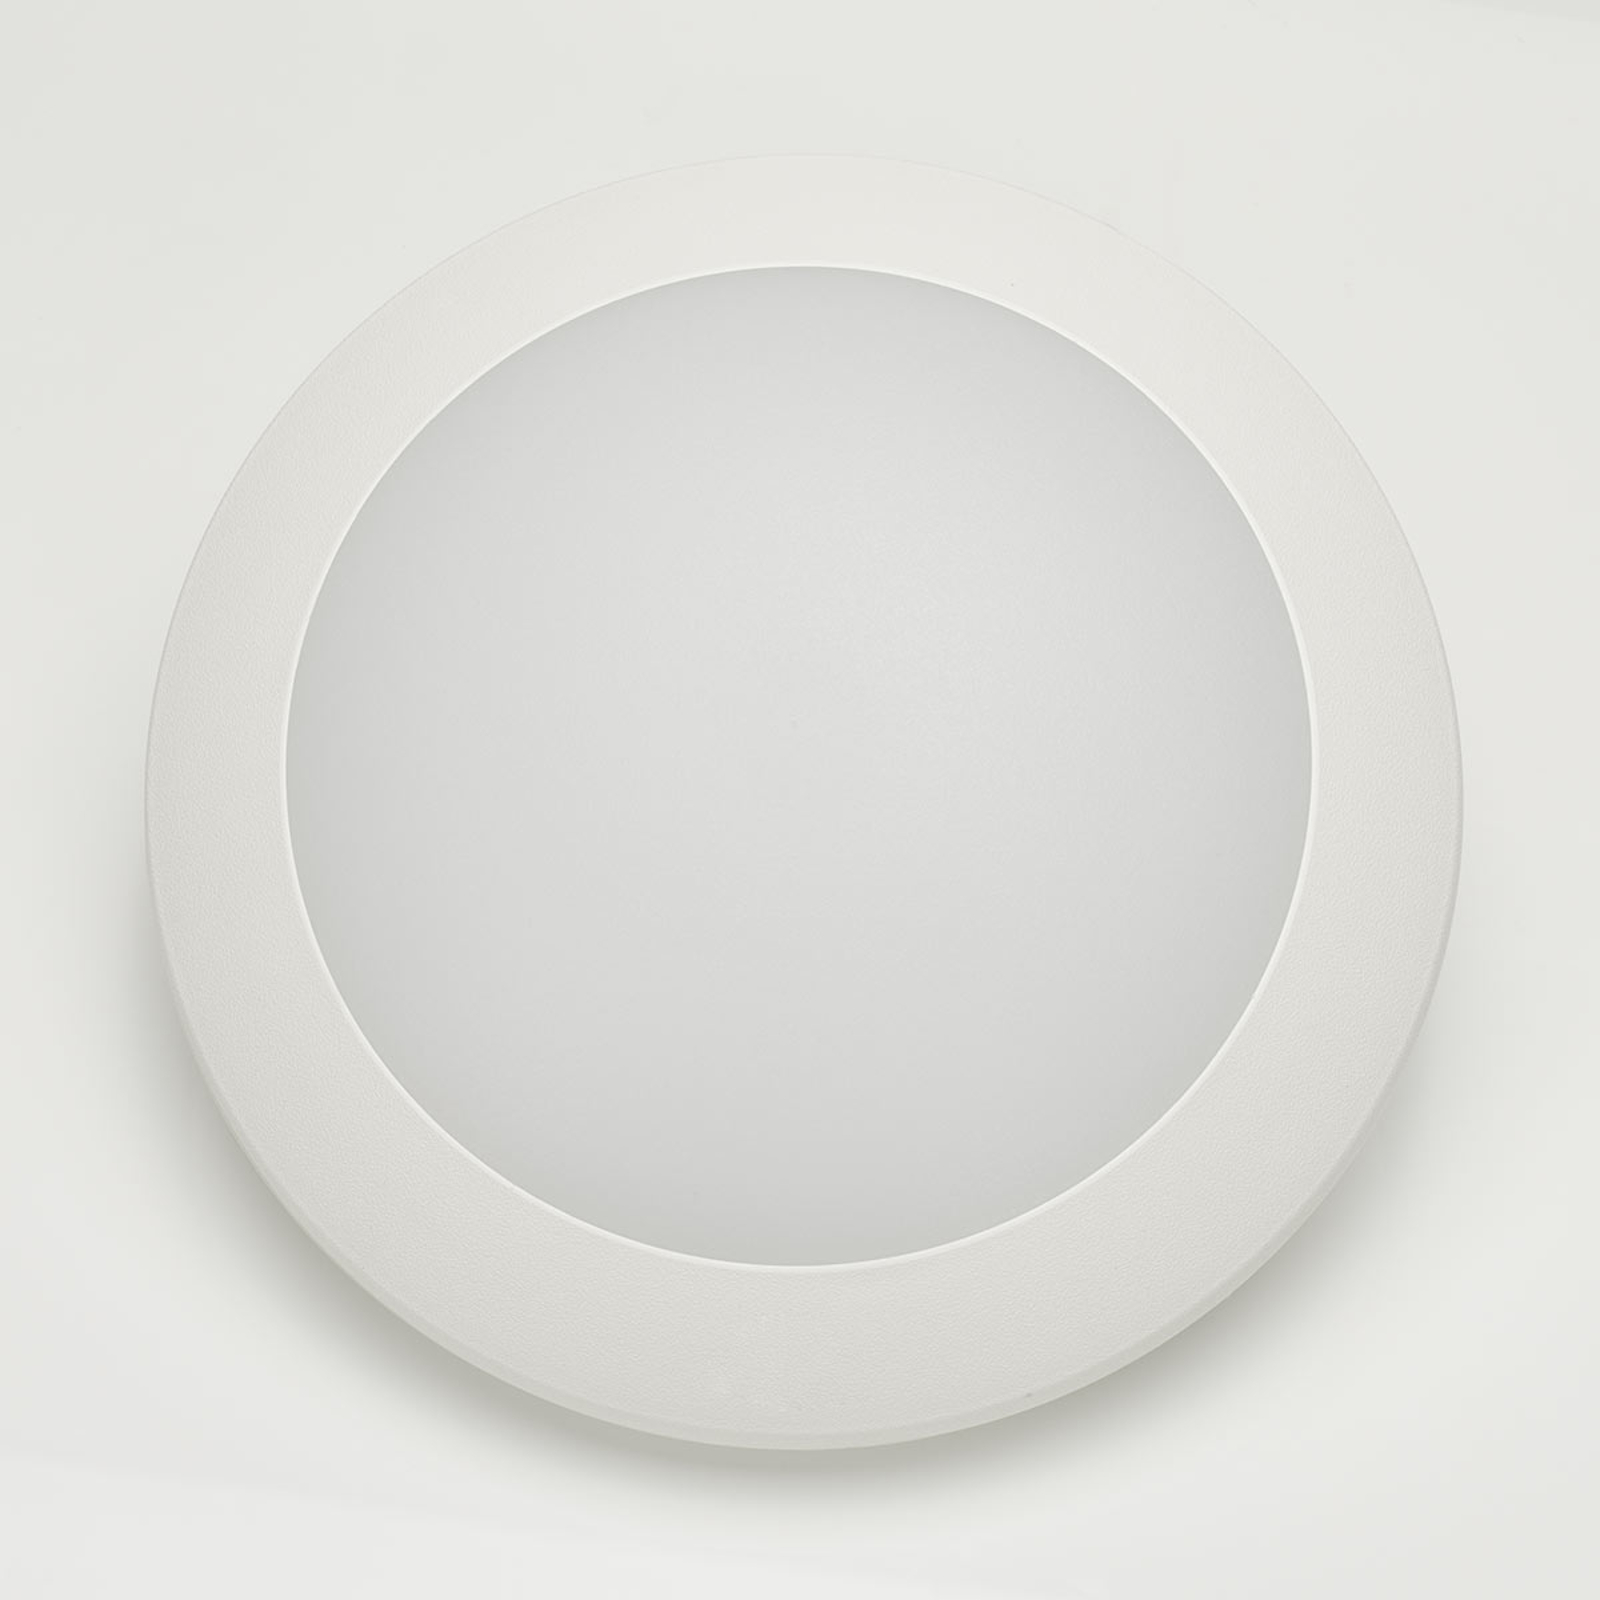 Applique LED esterni Berta Ø 27,5cm bianco 11W CCT